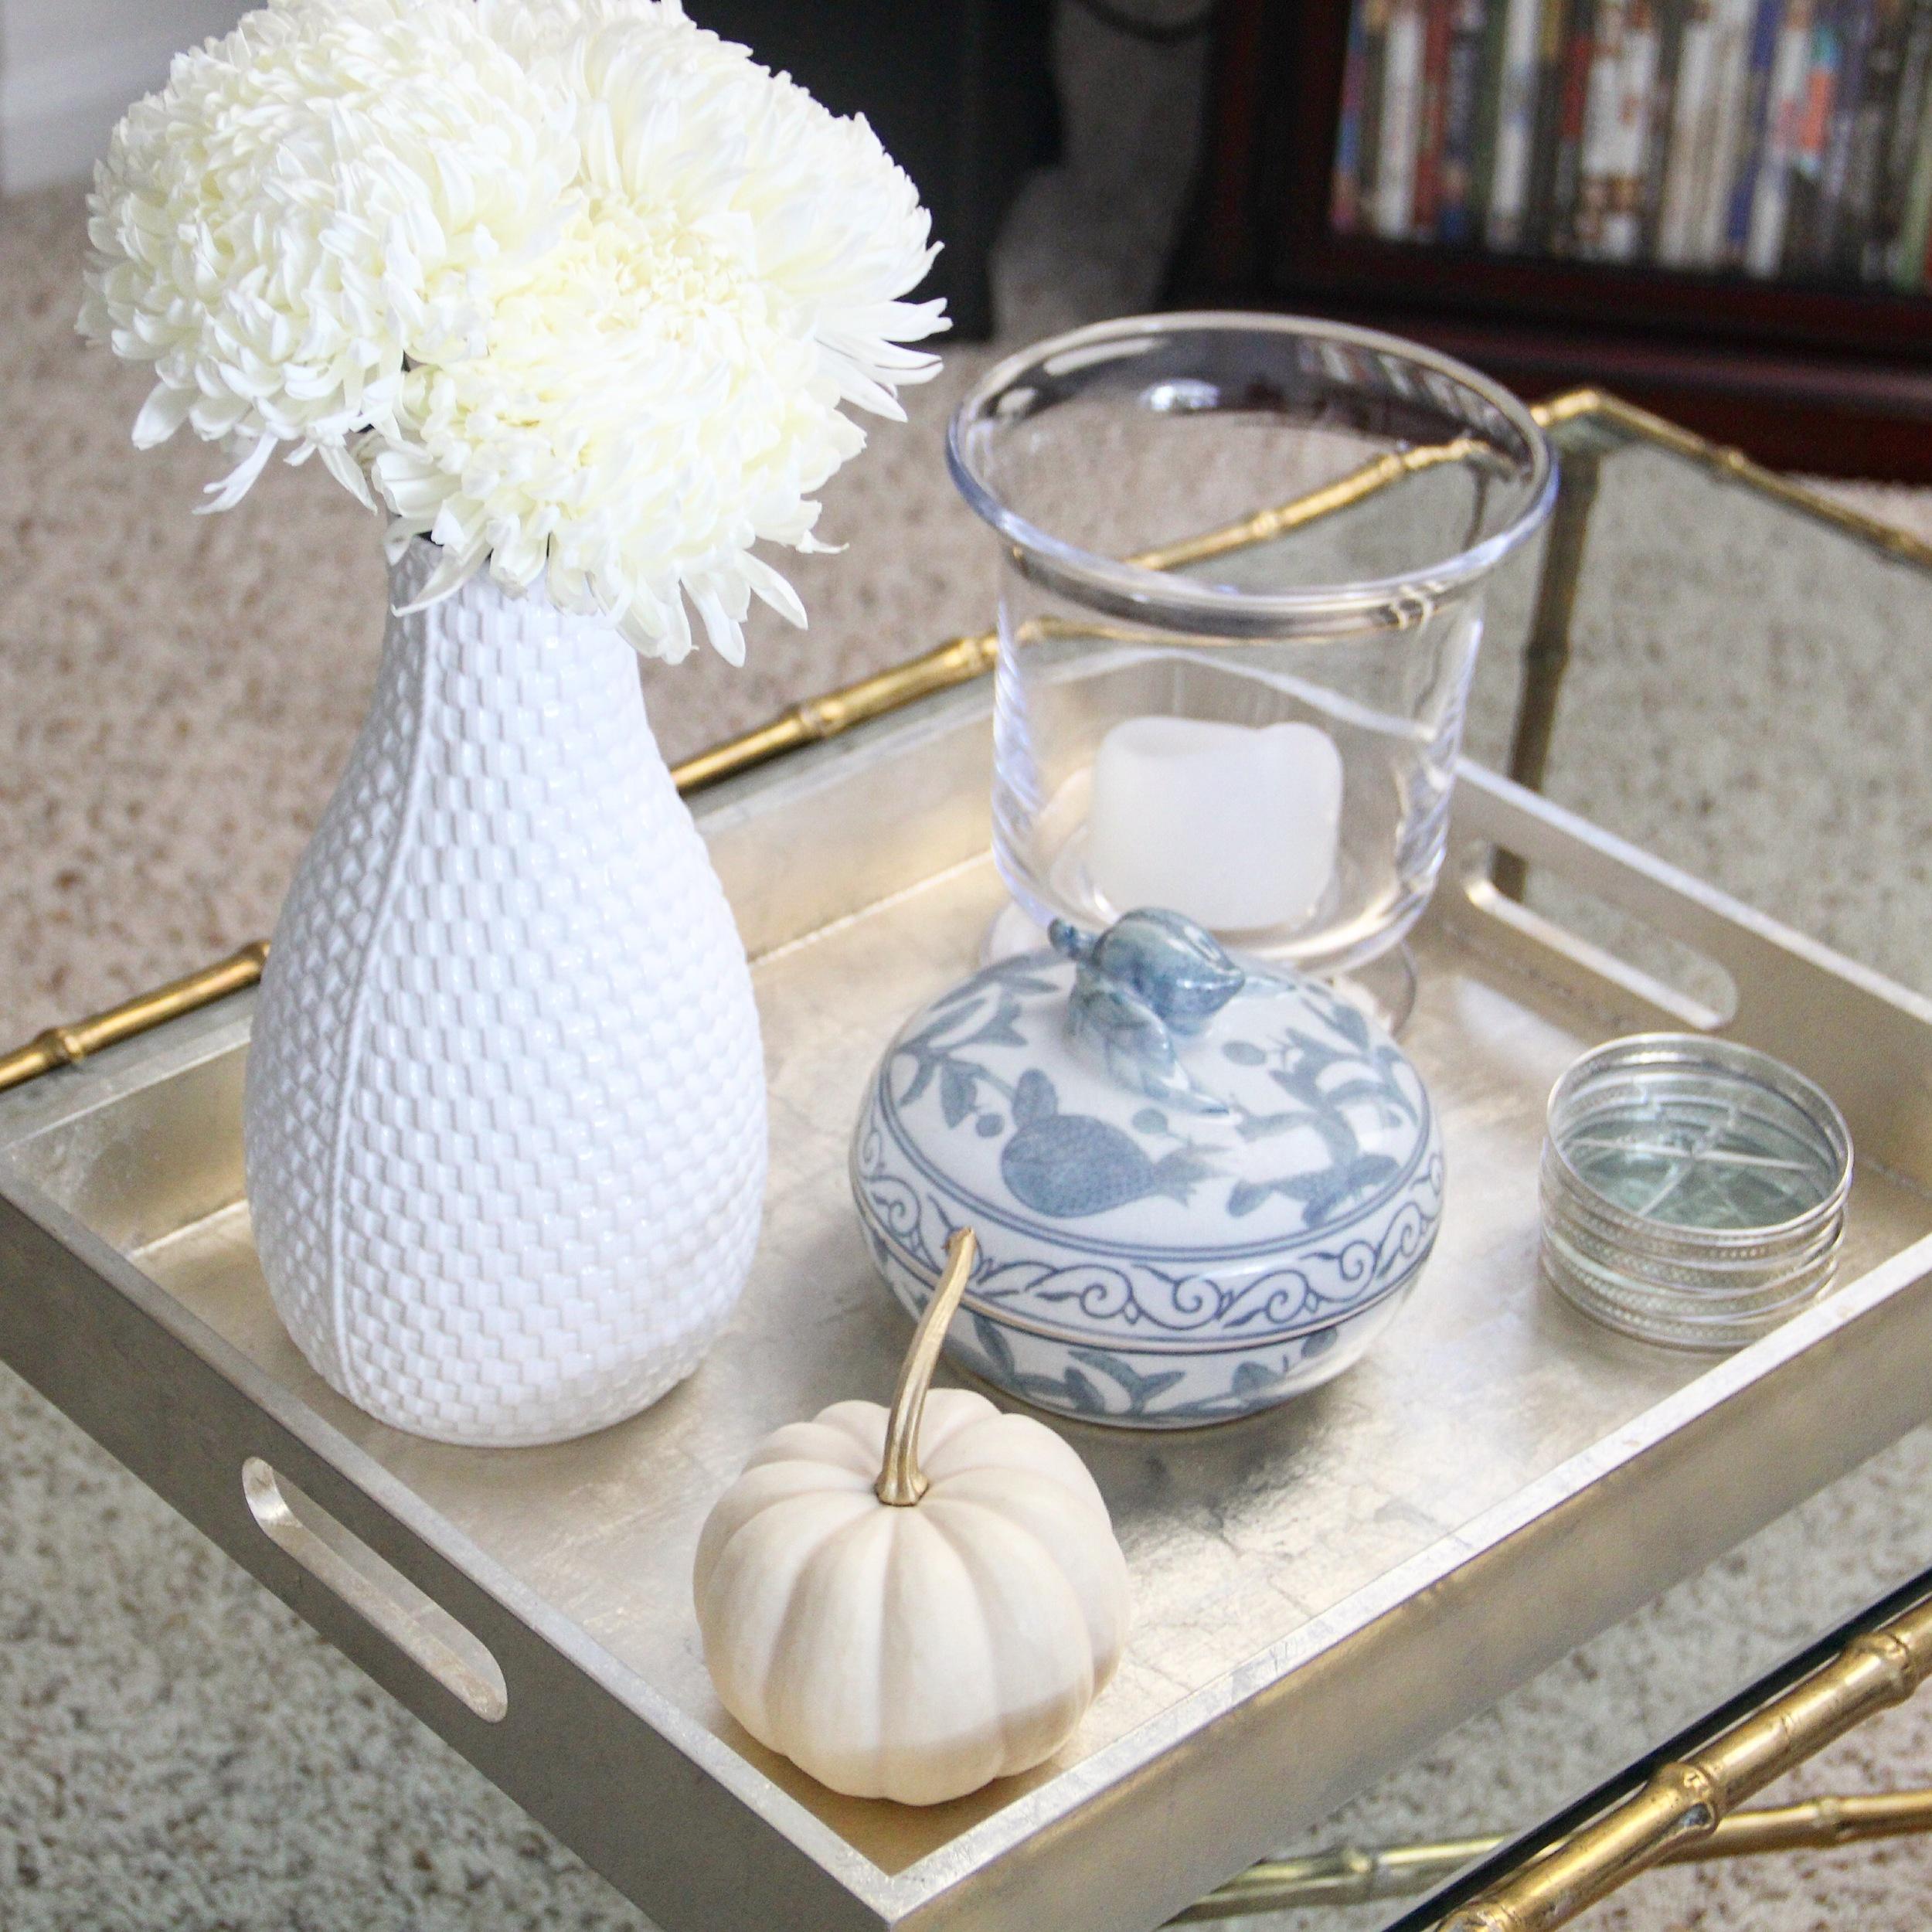 Redefining Domestics Coffee Table Decor.JPG